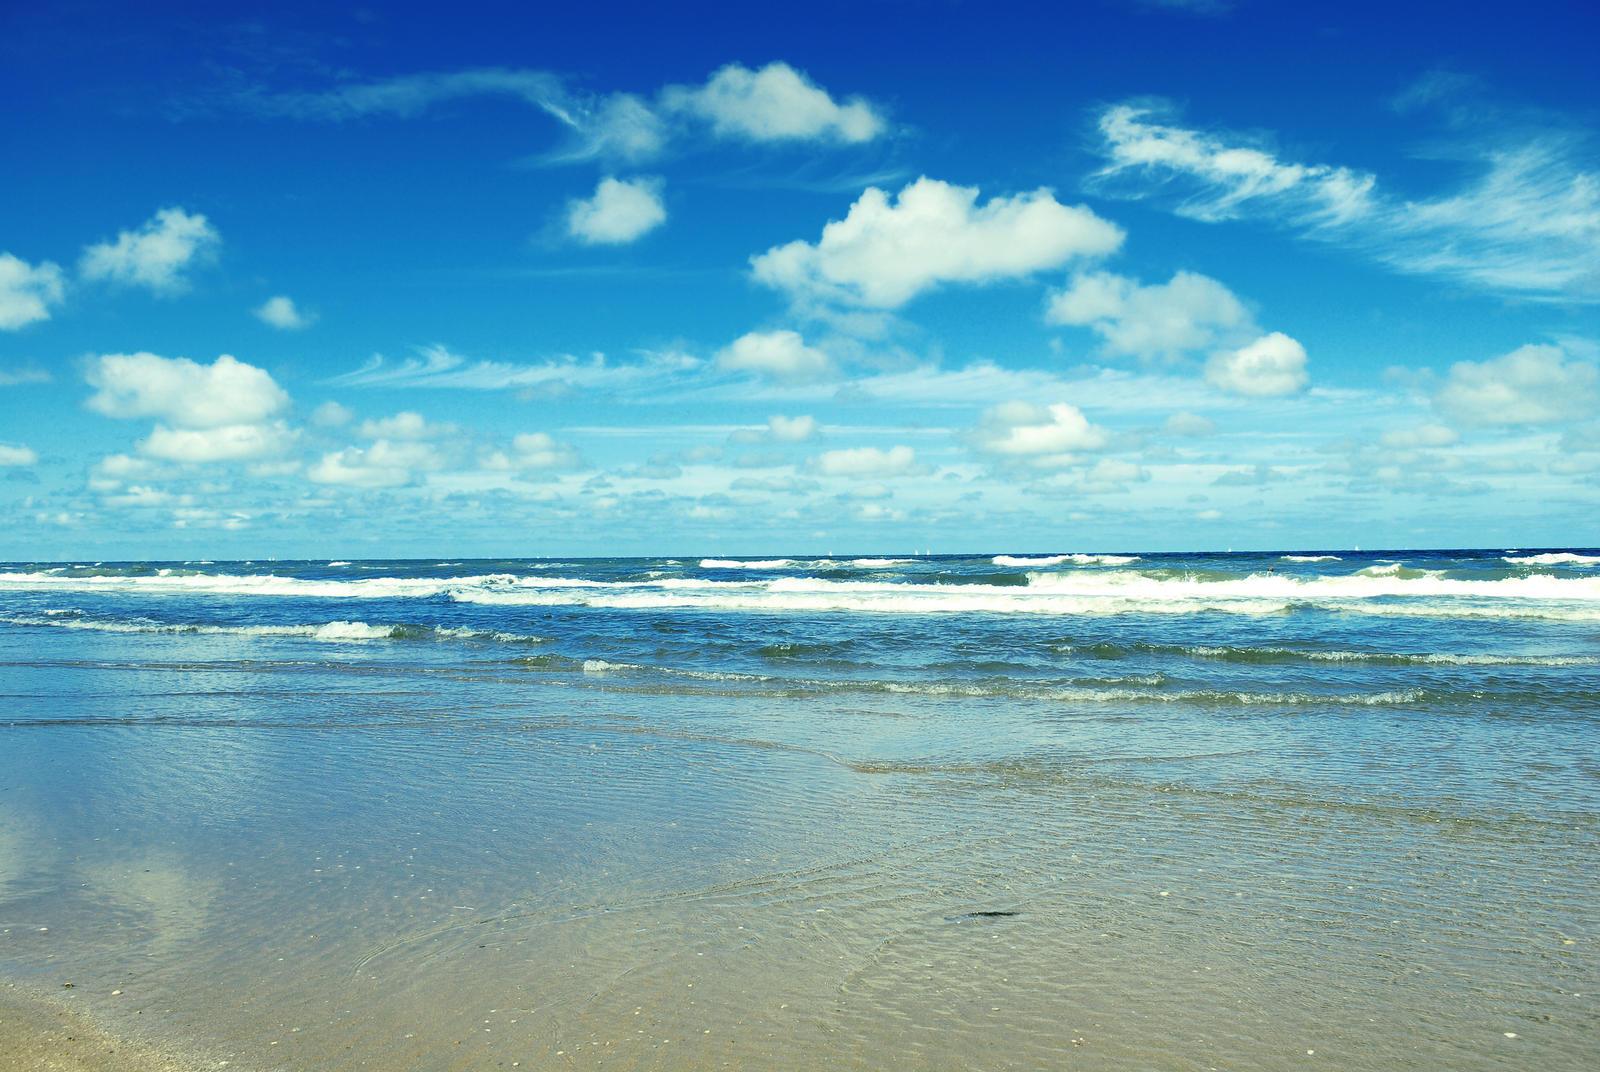 Beach Stock 2 by Sed-rah-Stock